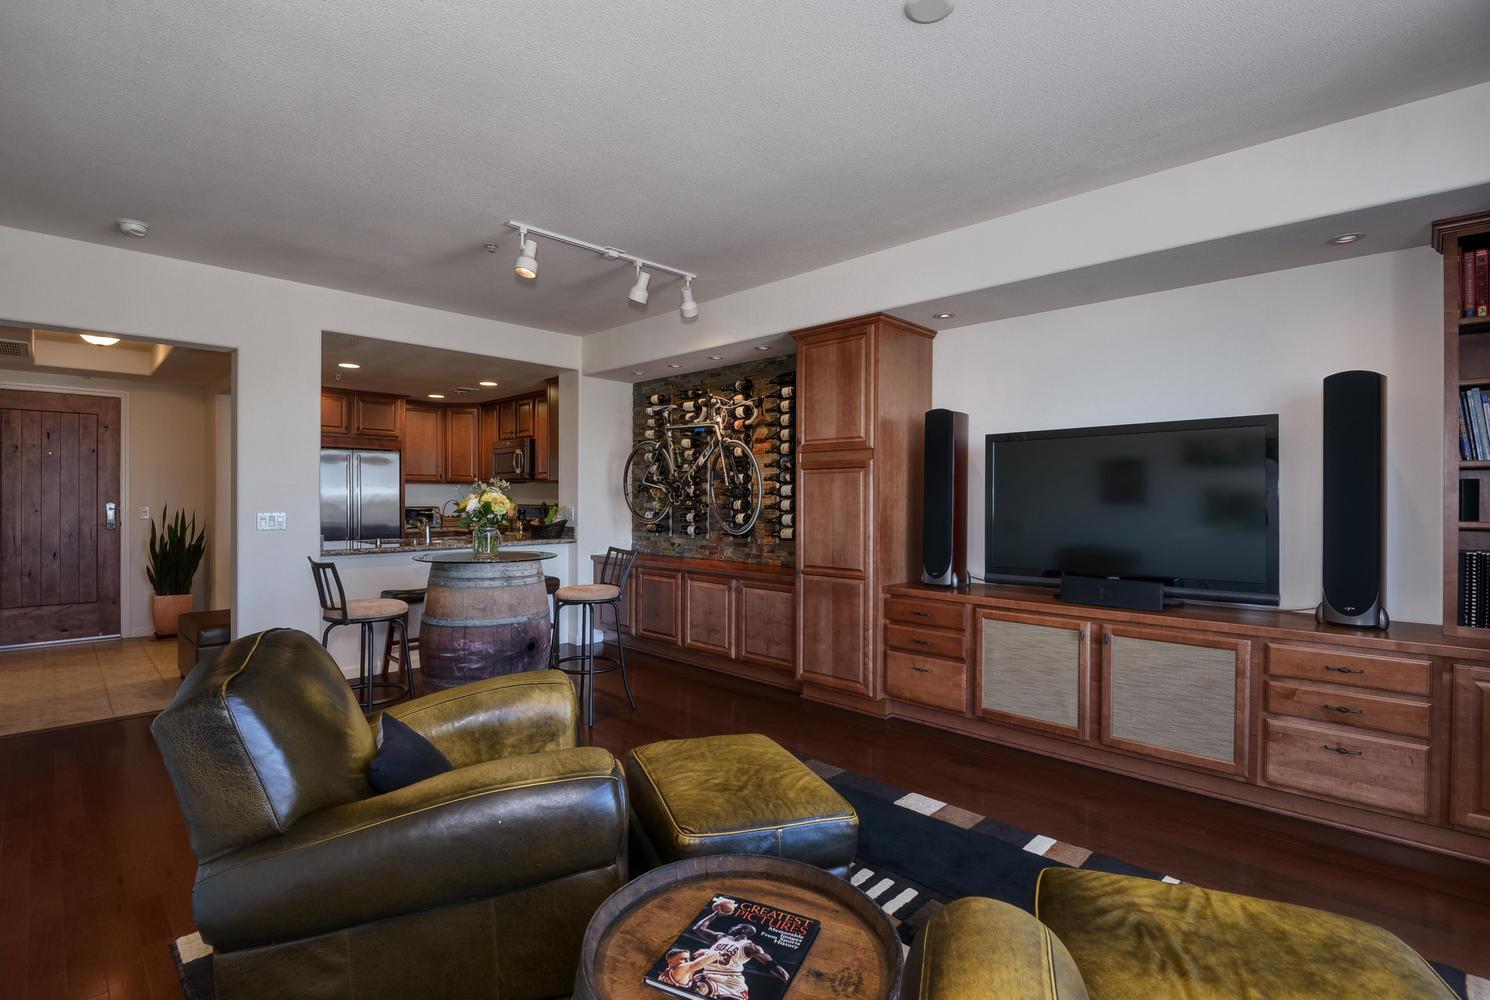 809 Auzerais Ave 419 San Jose-large-011-Living Area View 2-1490x1000-72dpi.jpg